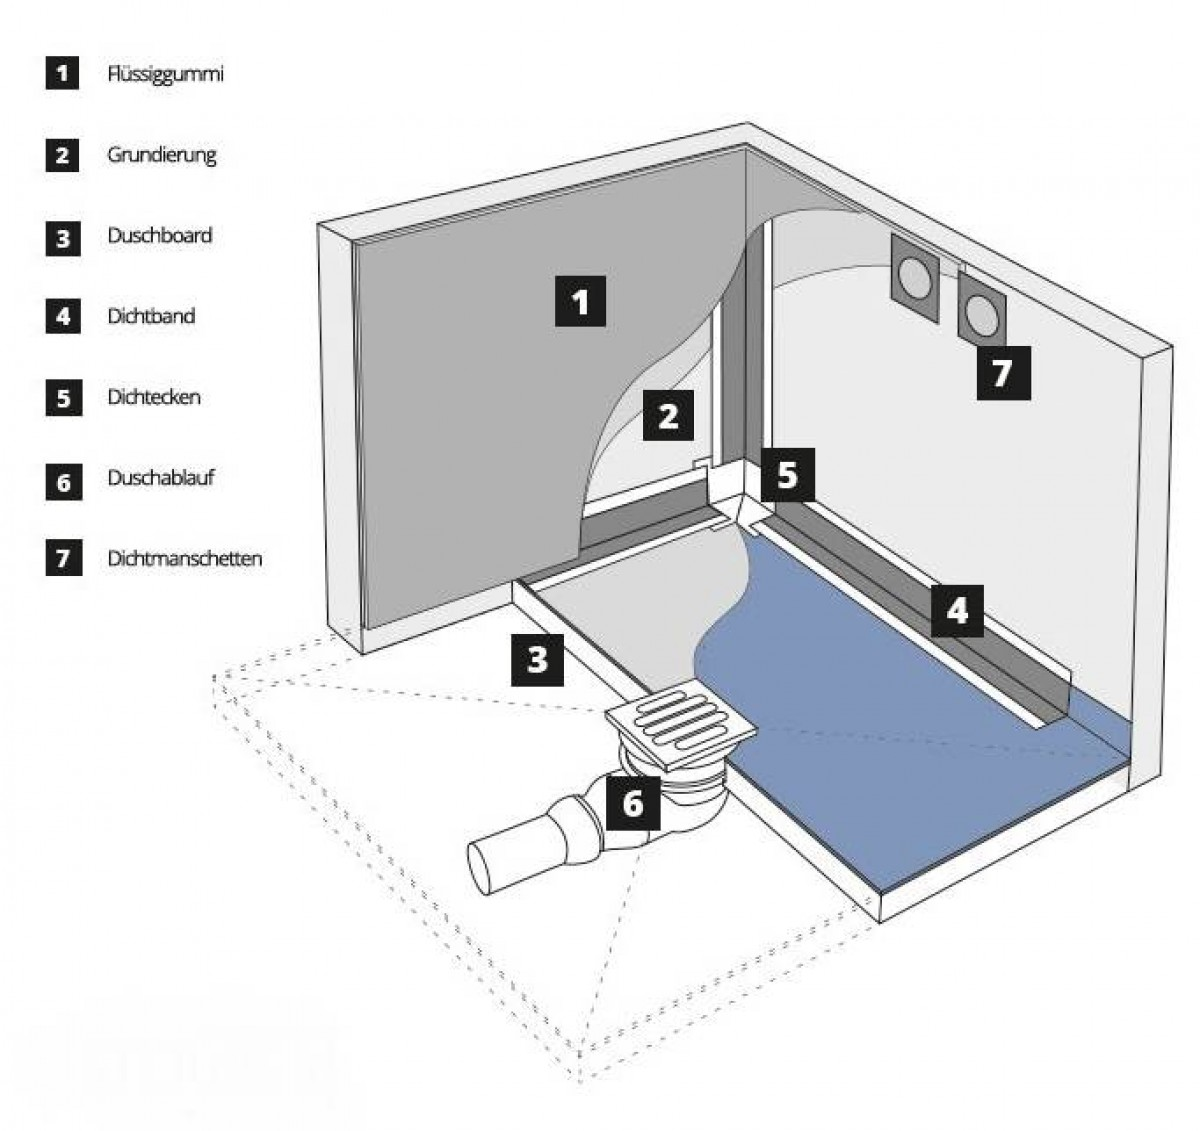 duschelement dichtband abdichtband dusche abdichtungsband jumbo shop superg nstiger online. Black Bedroom Furniture Sets. Home Design Ideas